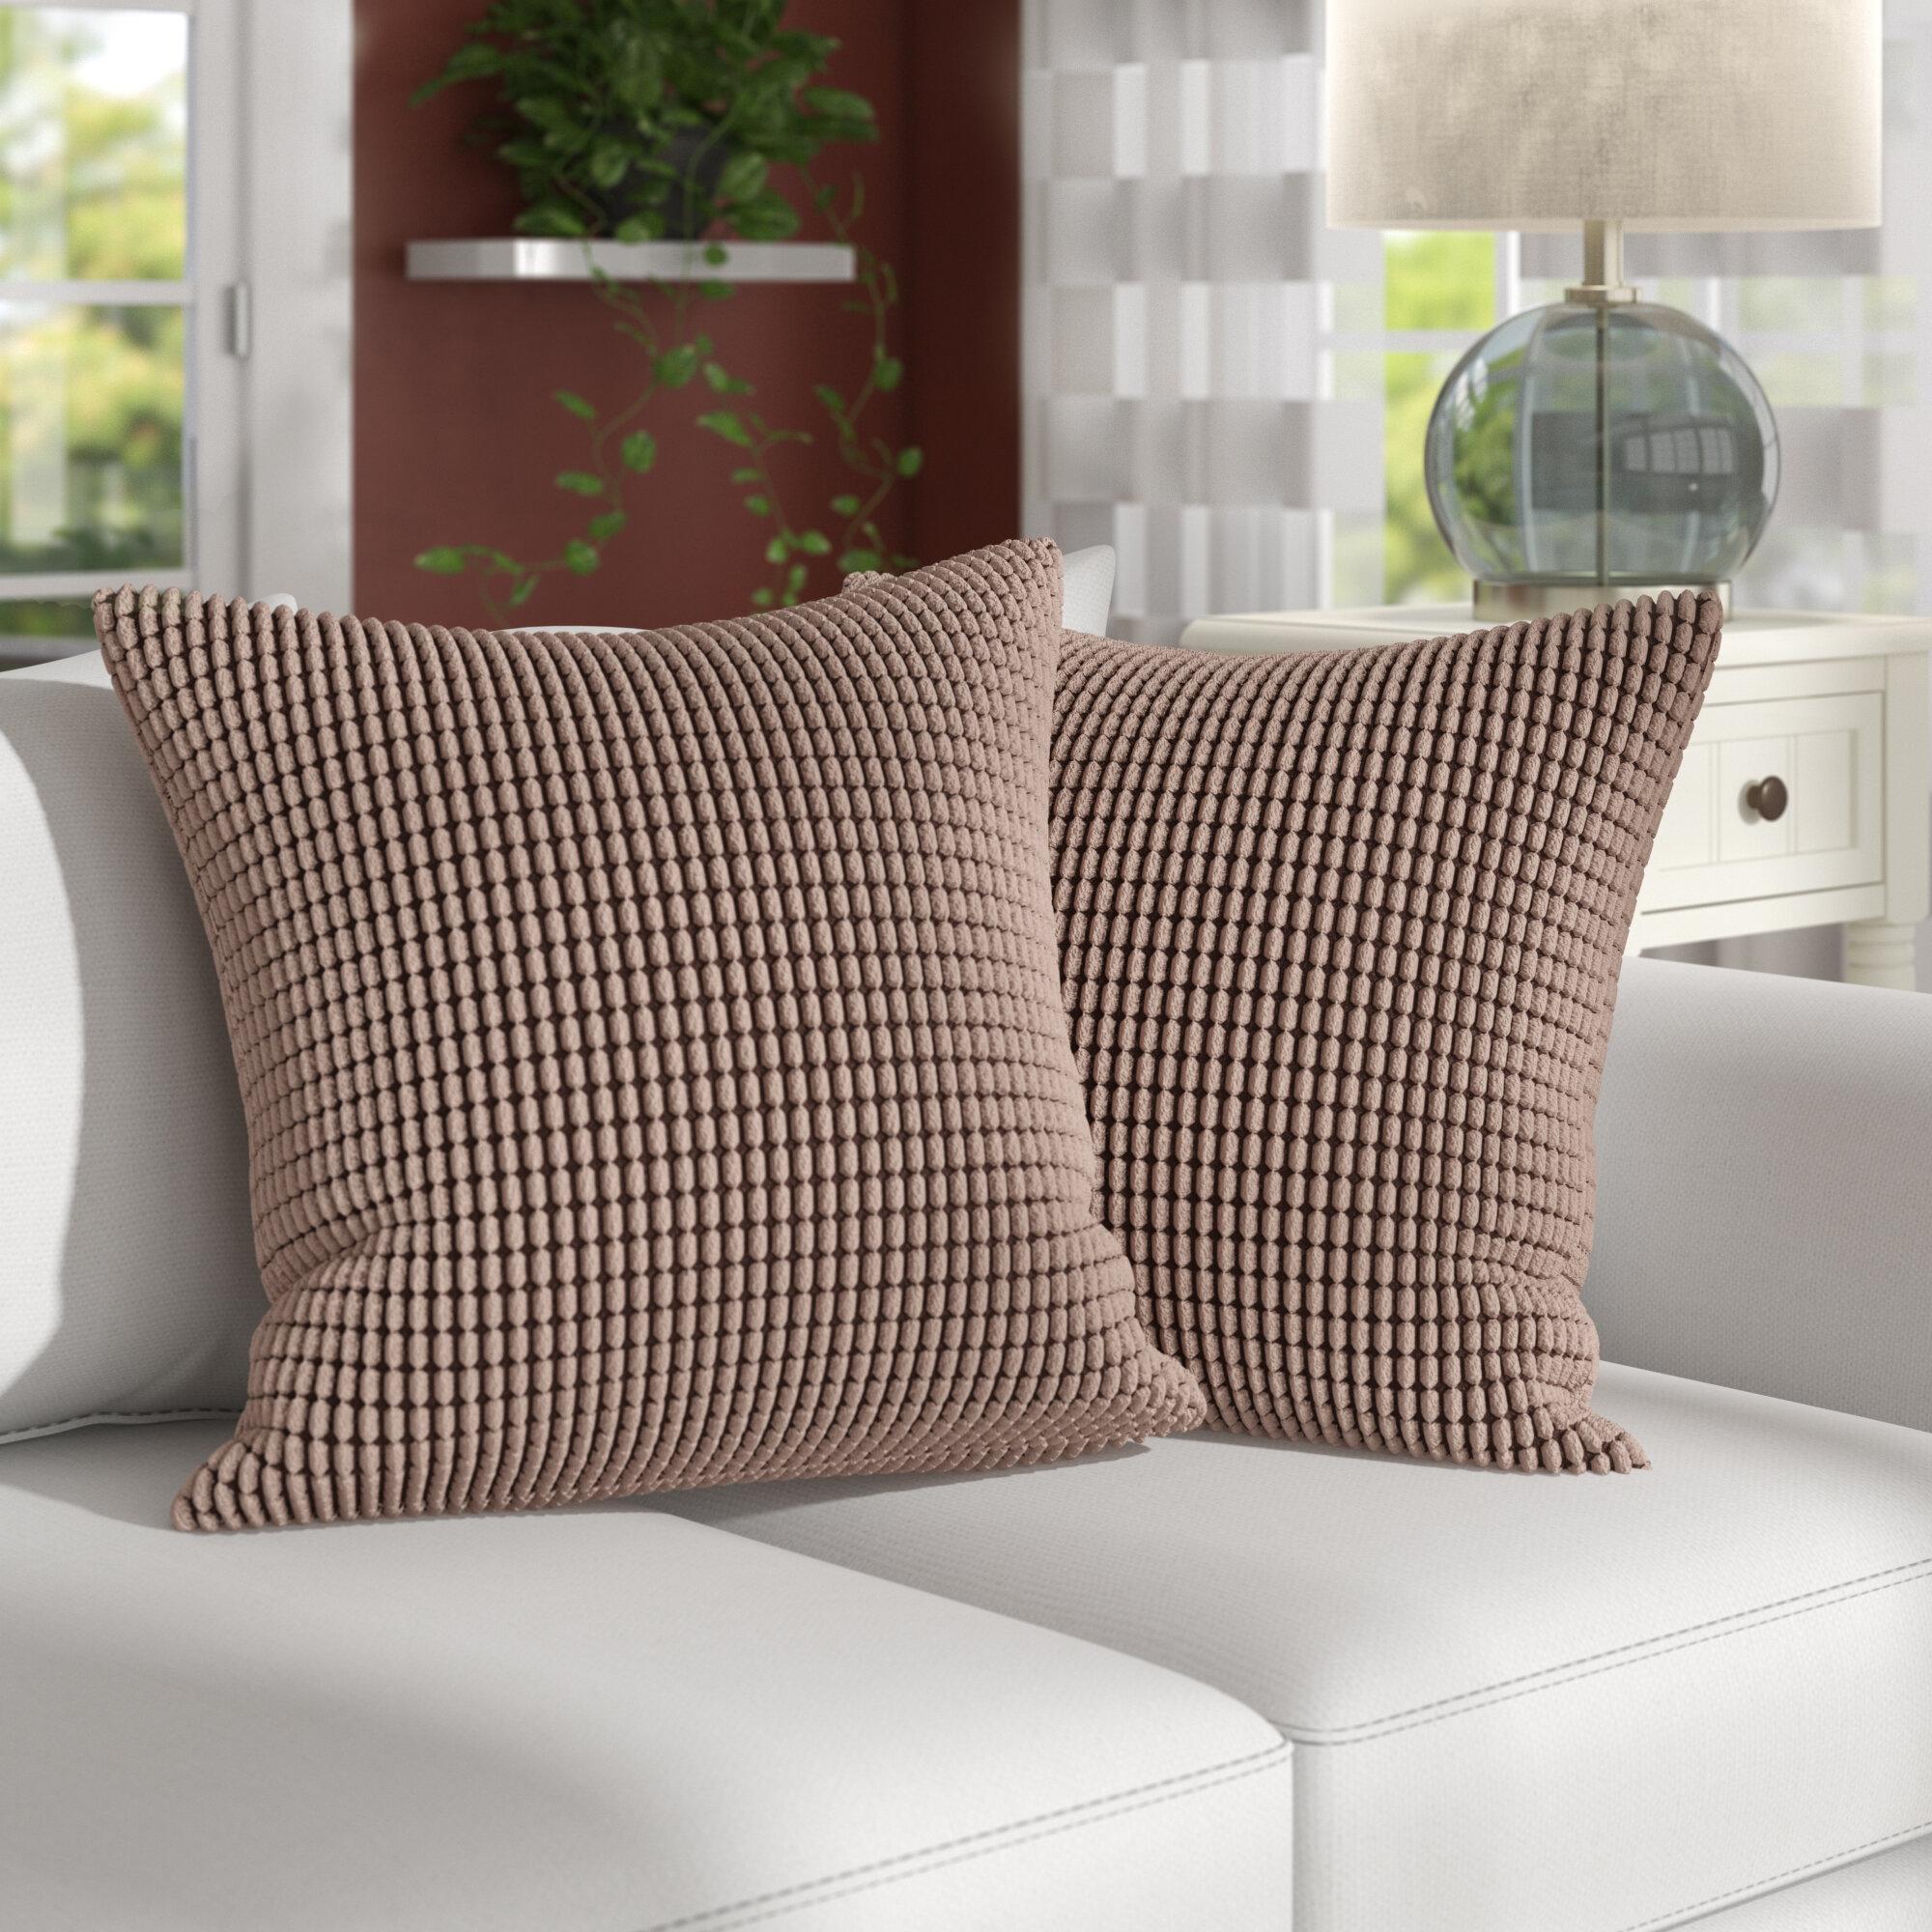 Square Pillow Case